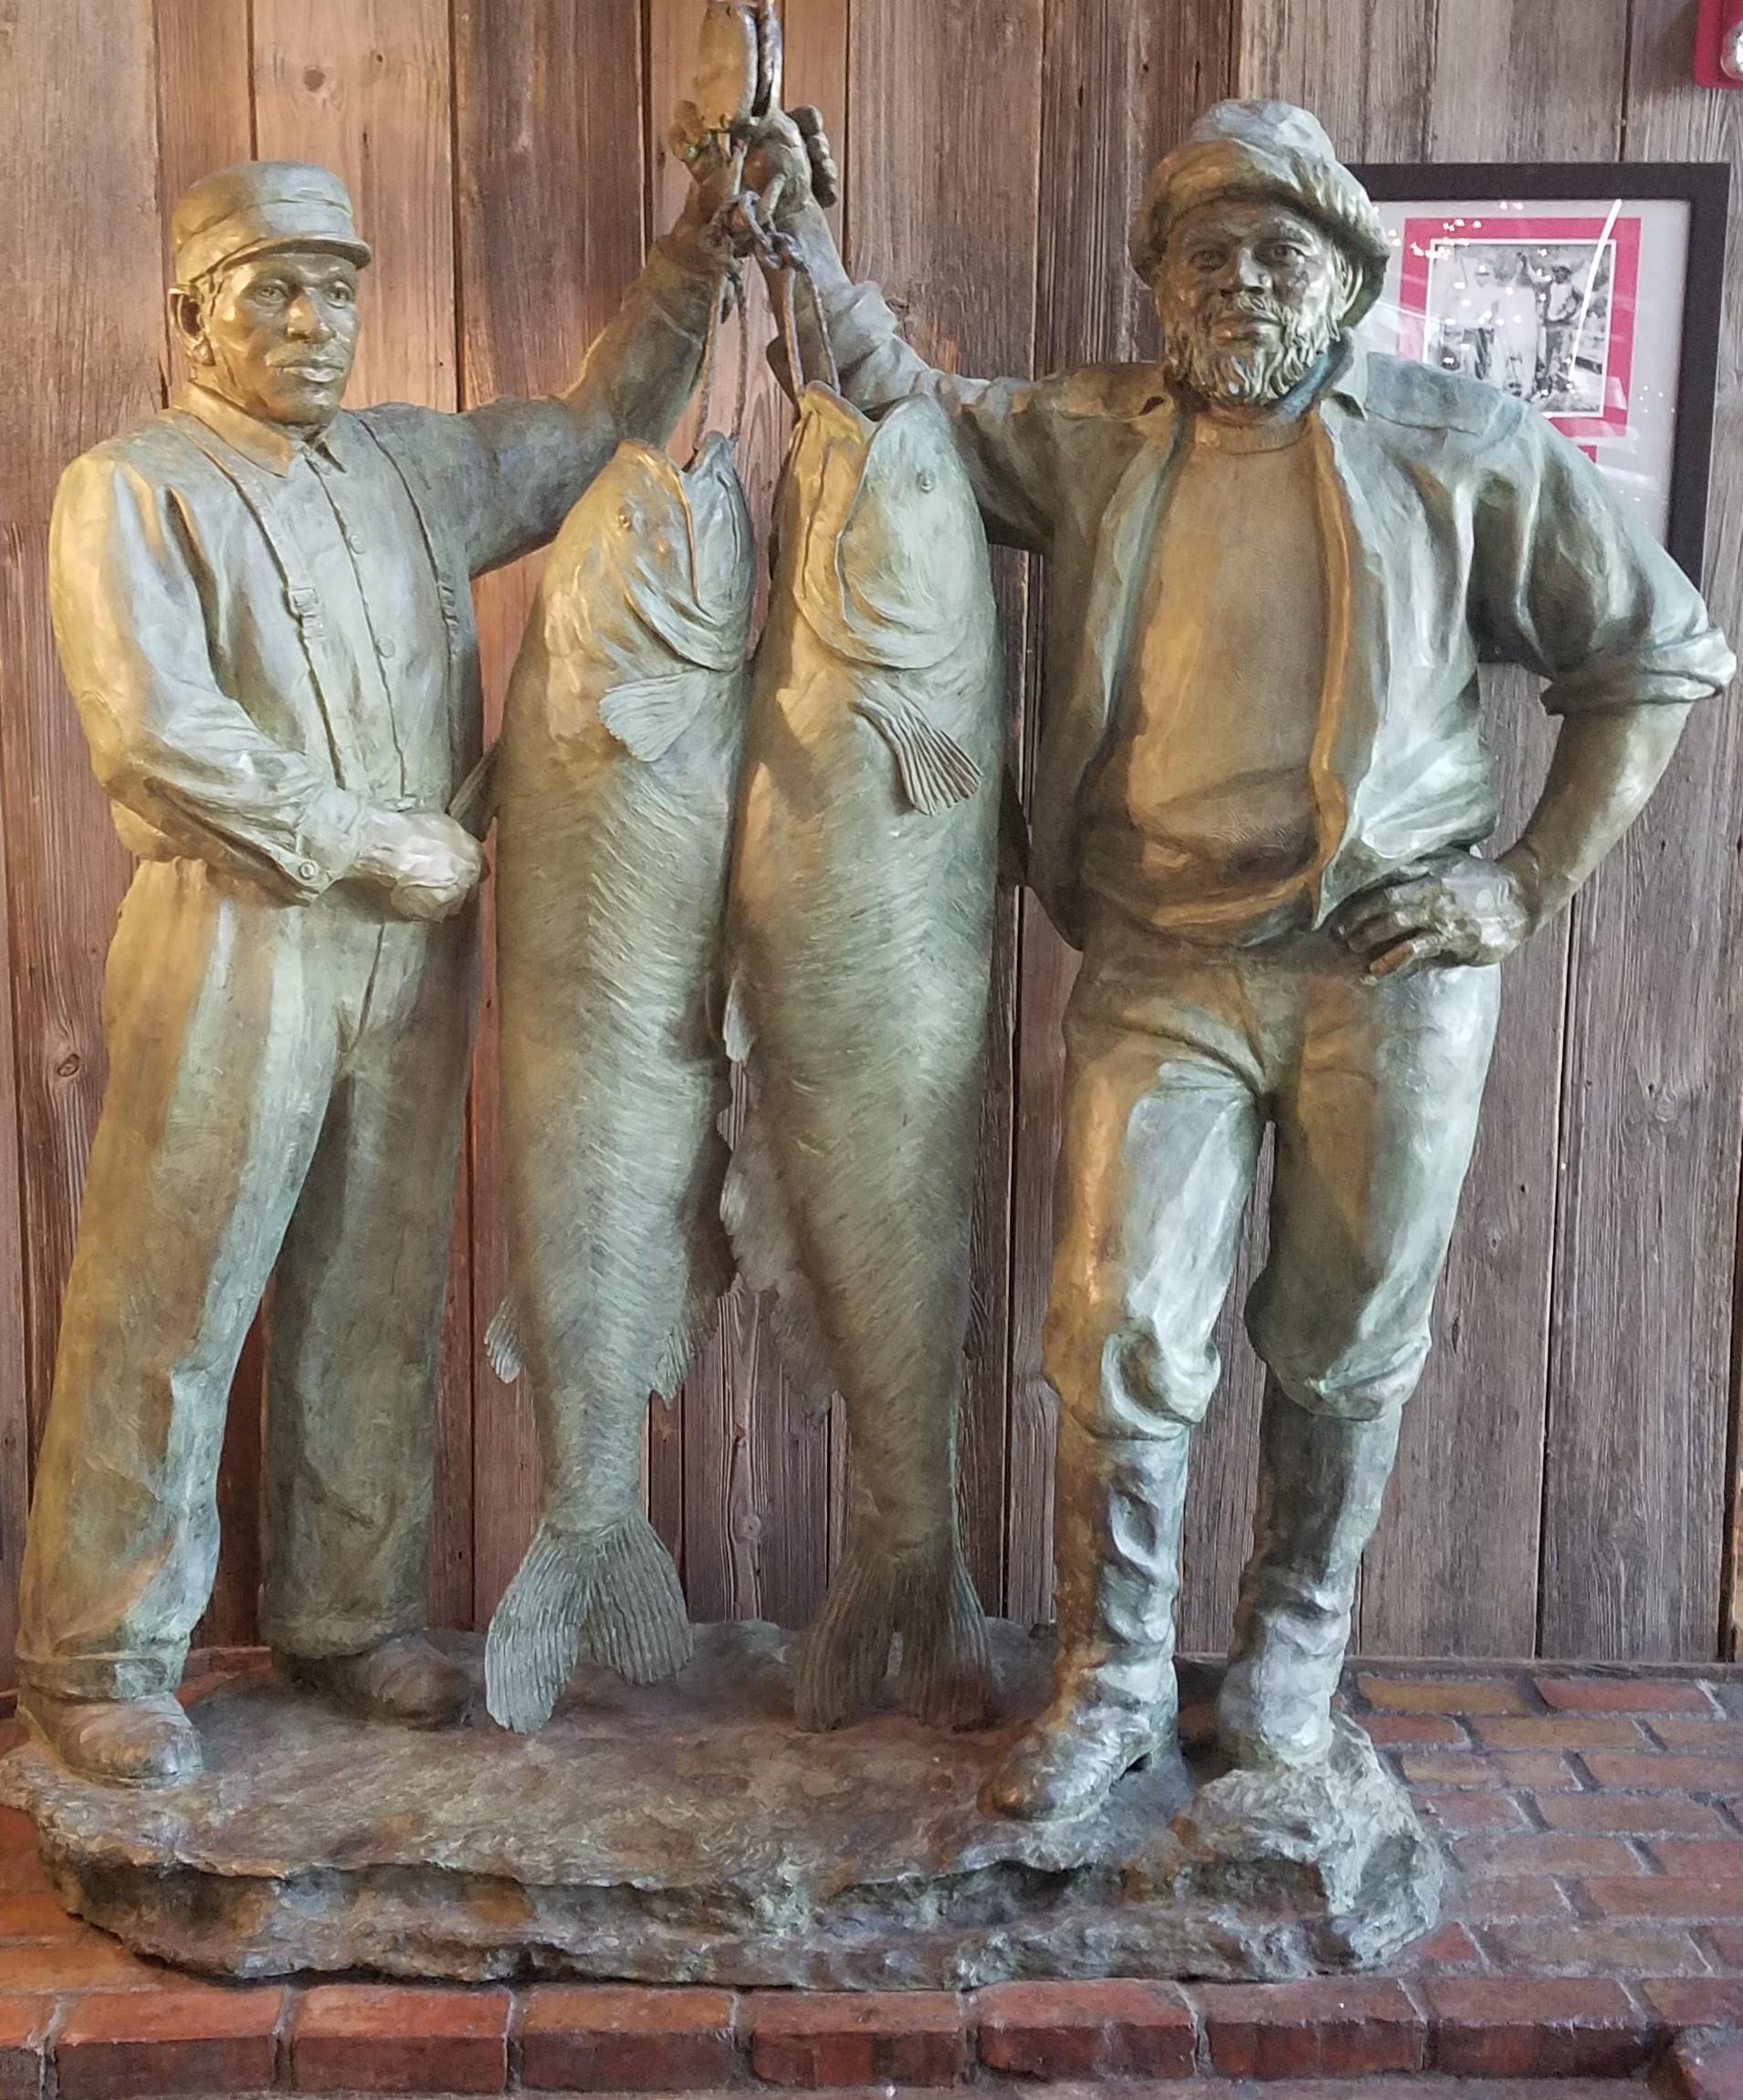 Abe Burns & Jake Washington - 92lb and 110lb Blue Catfish Bronze Sculpture Located inside Abe & Jake's Landing.